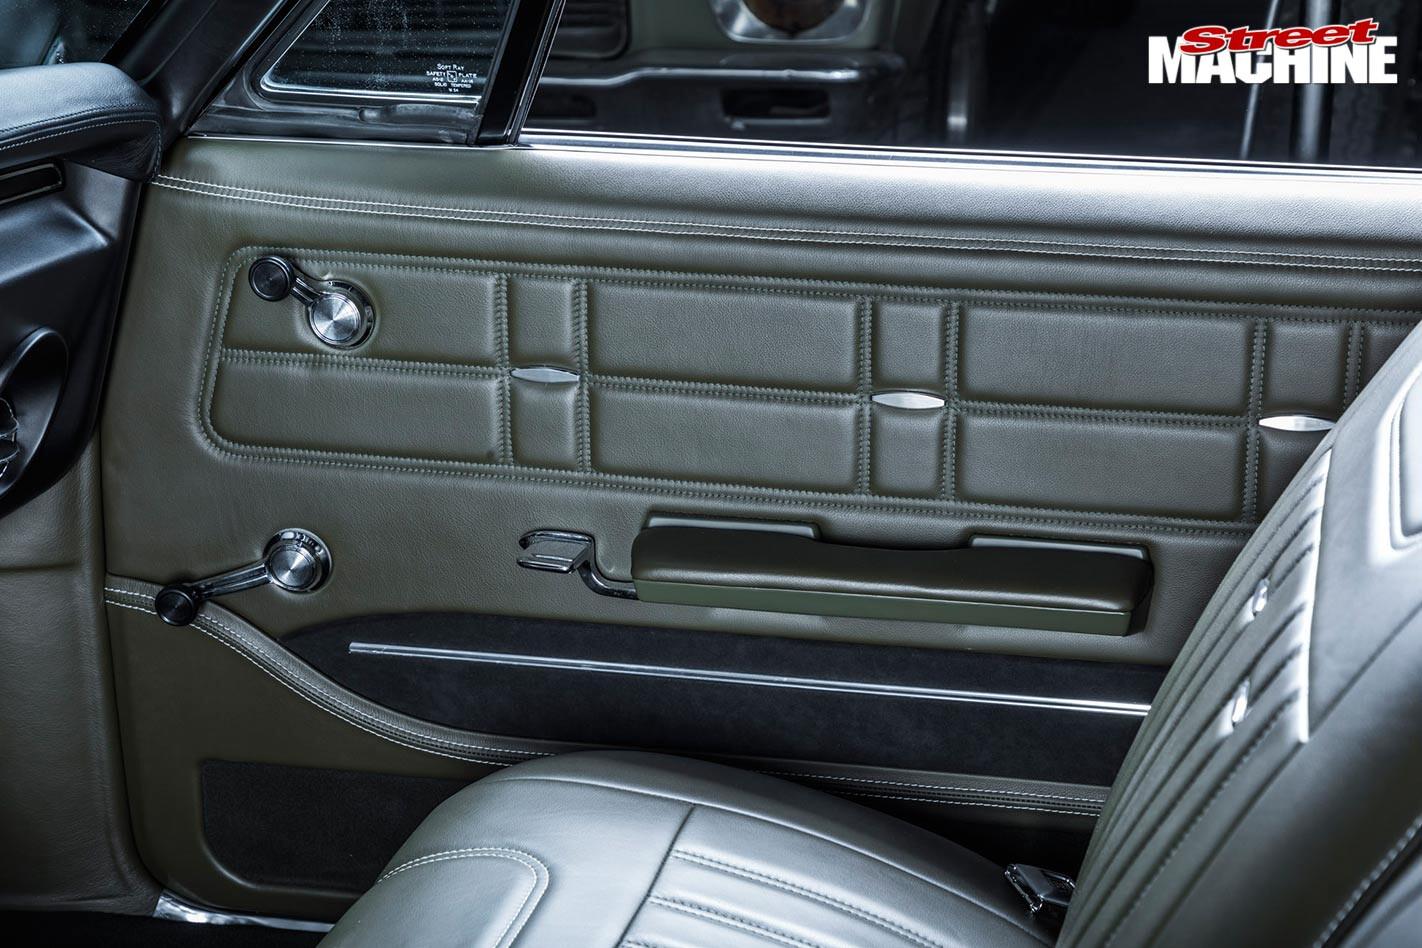 Chev Impala door trim